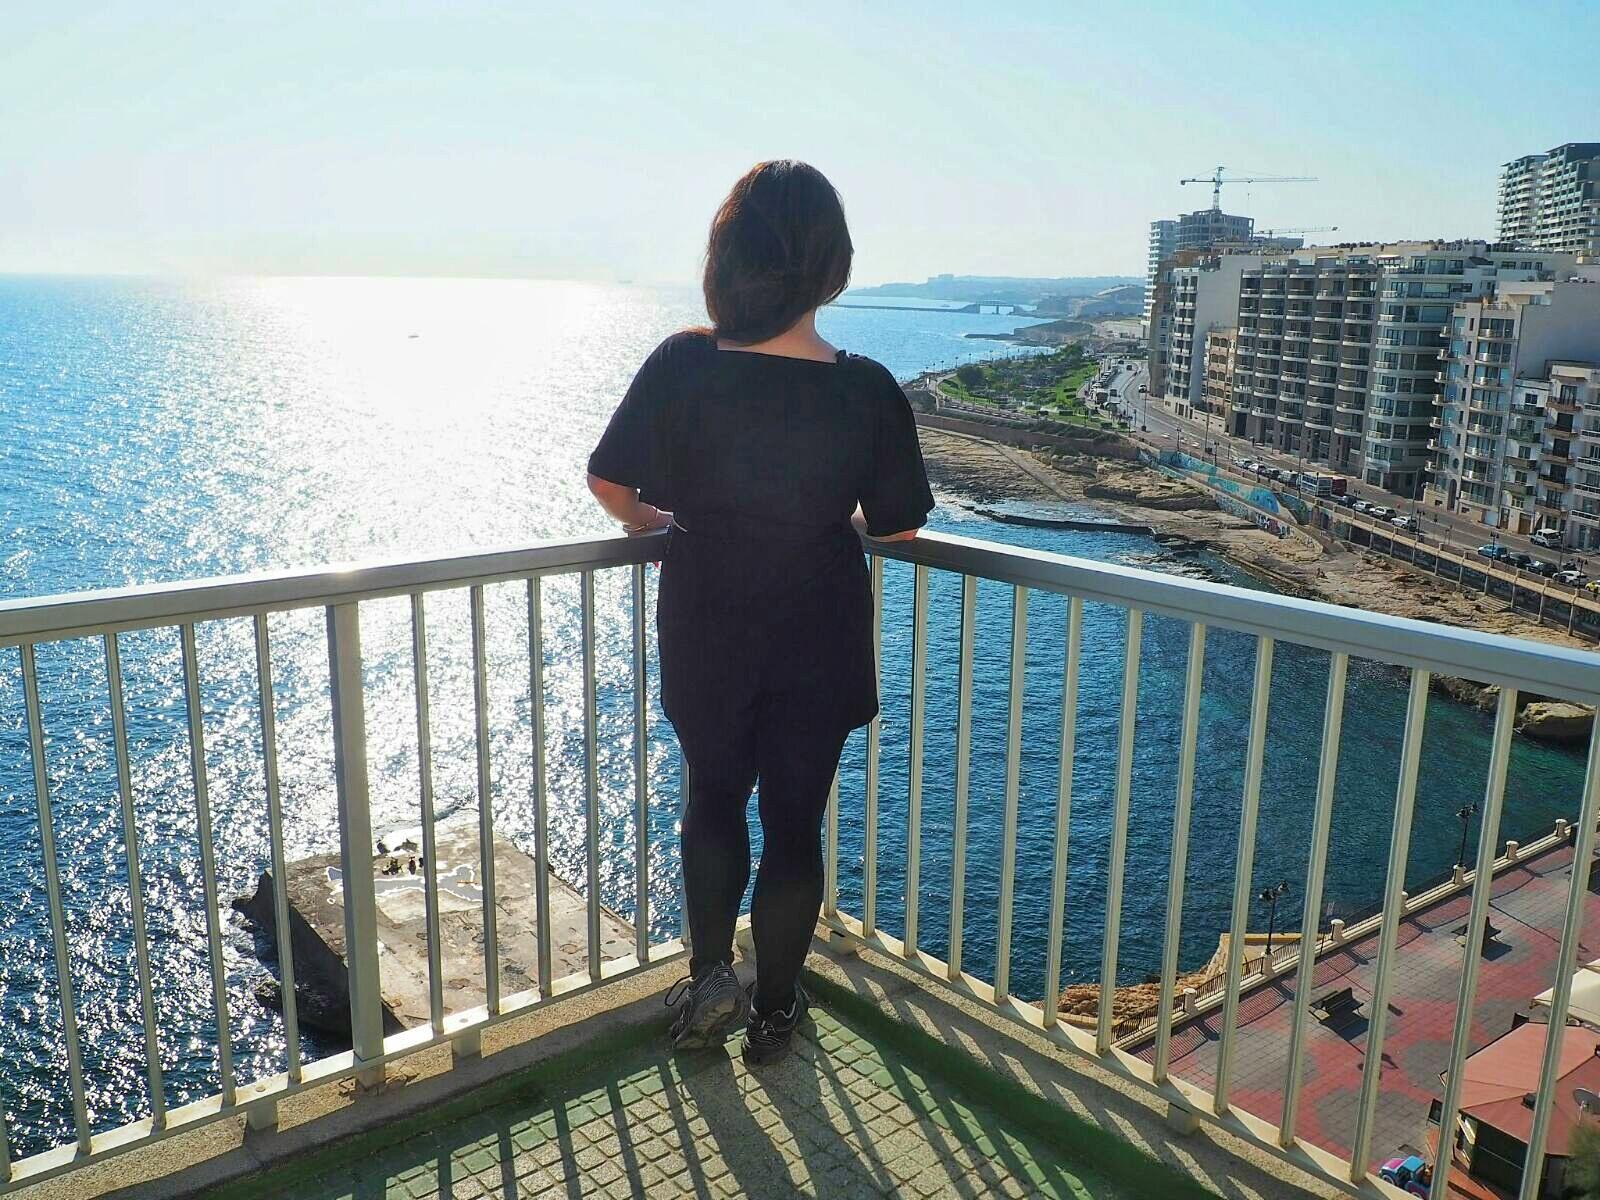 www.whatsupcourtney.com Malta: Guide to Gozo and Comino